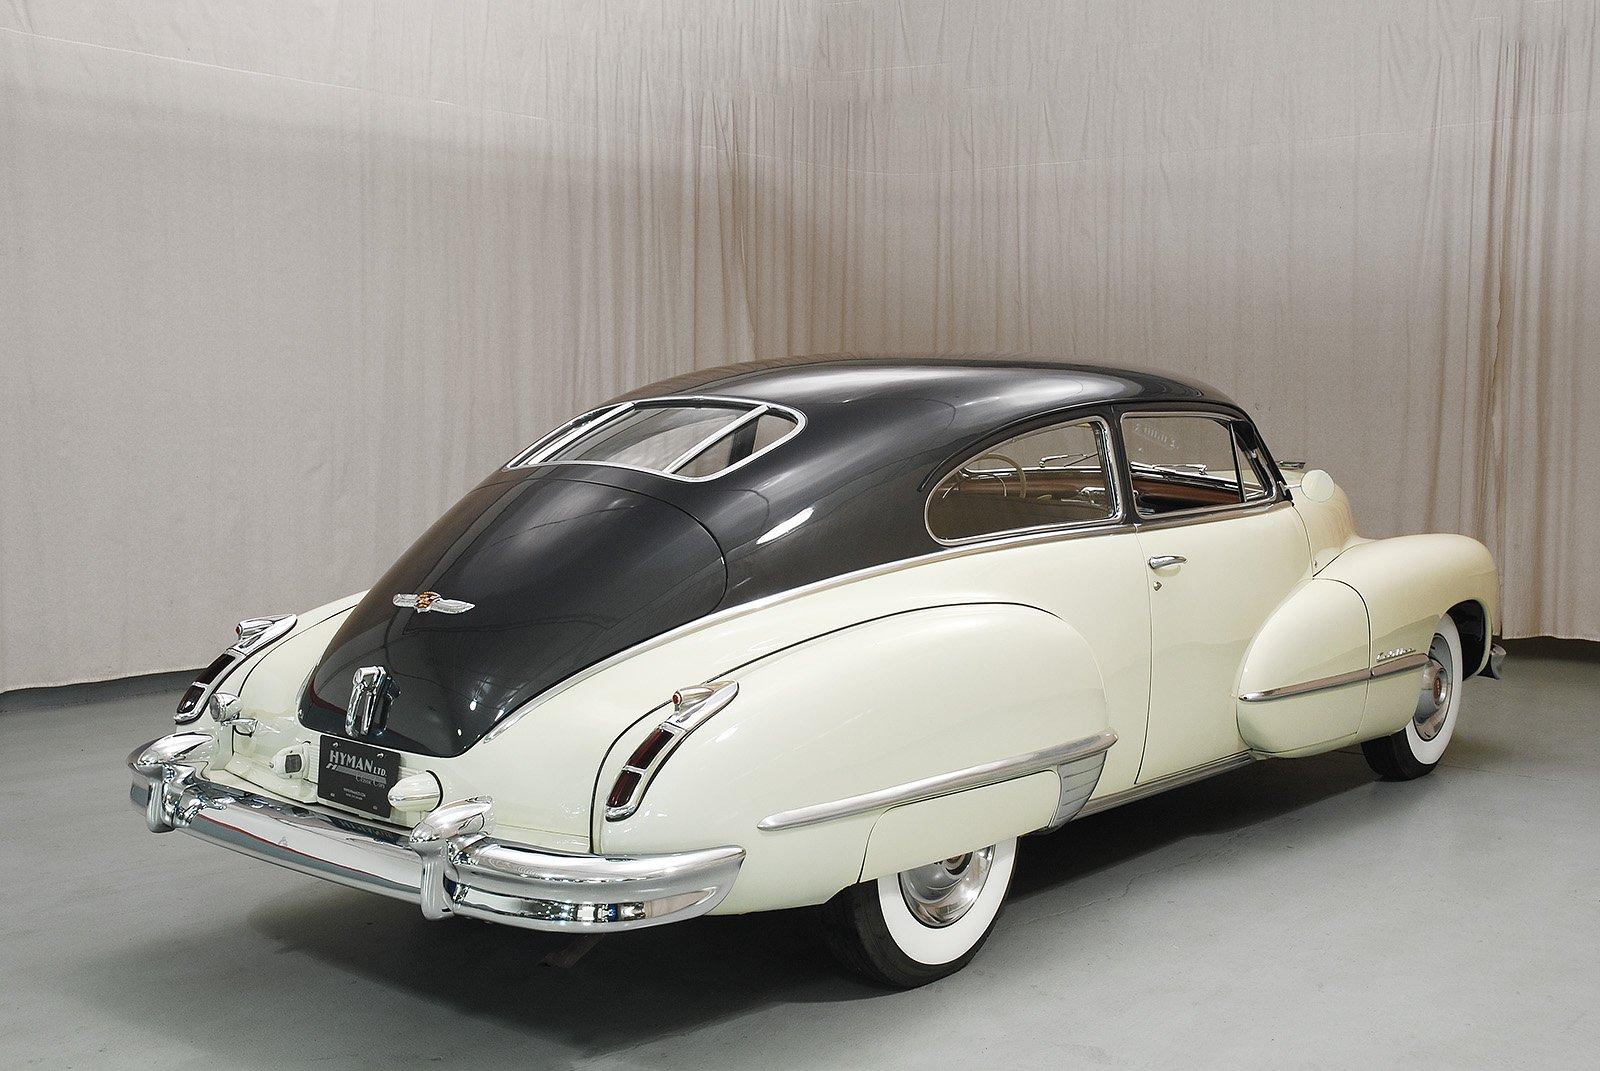 1947 Cadillac 62 Fastback Hyman Ltd Classic Cars